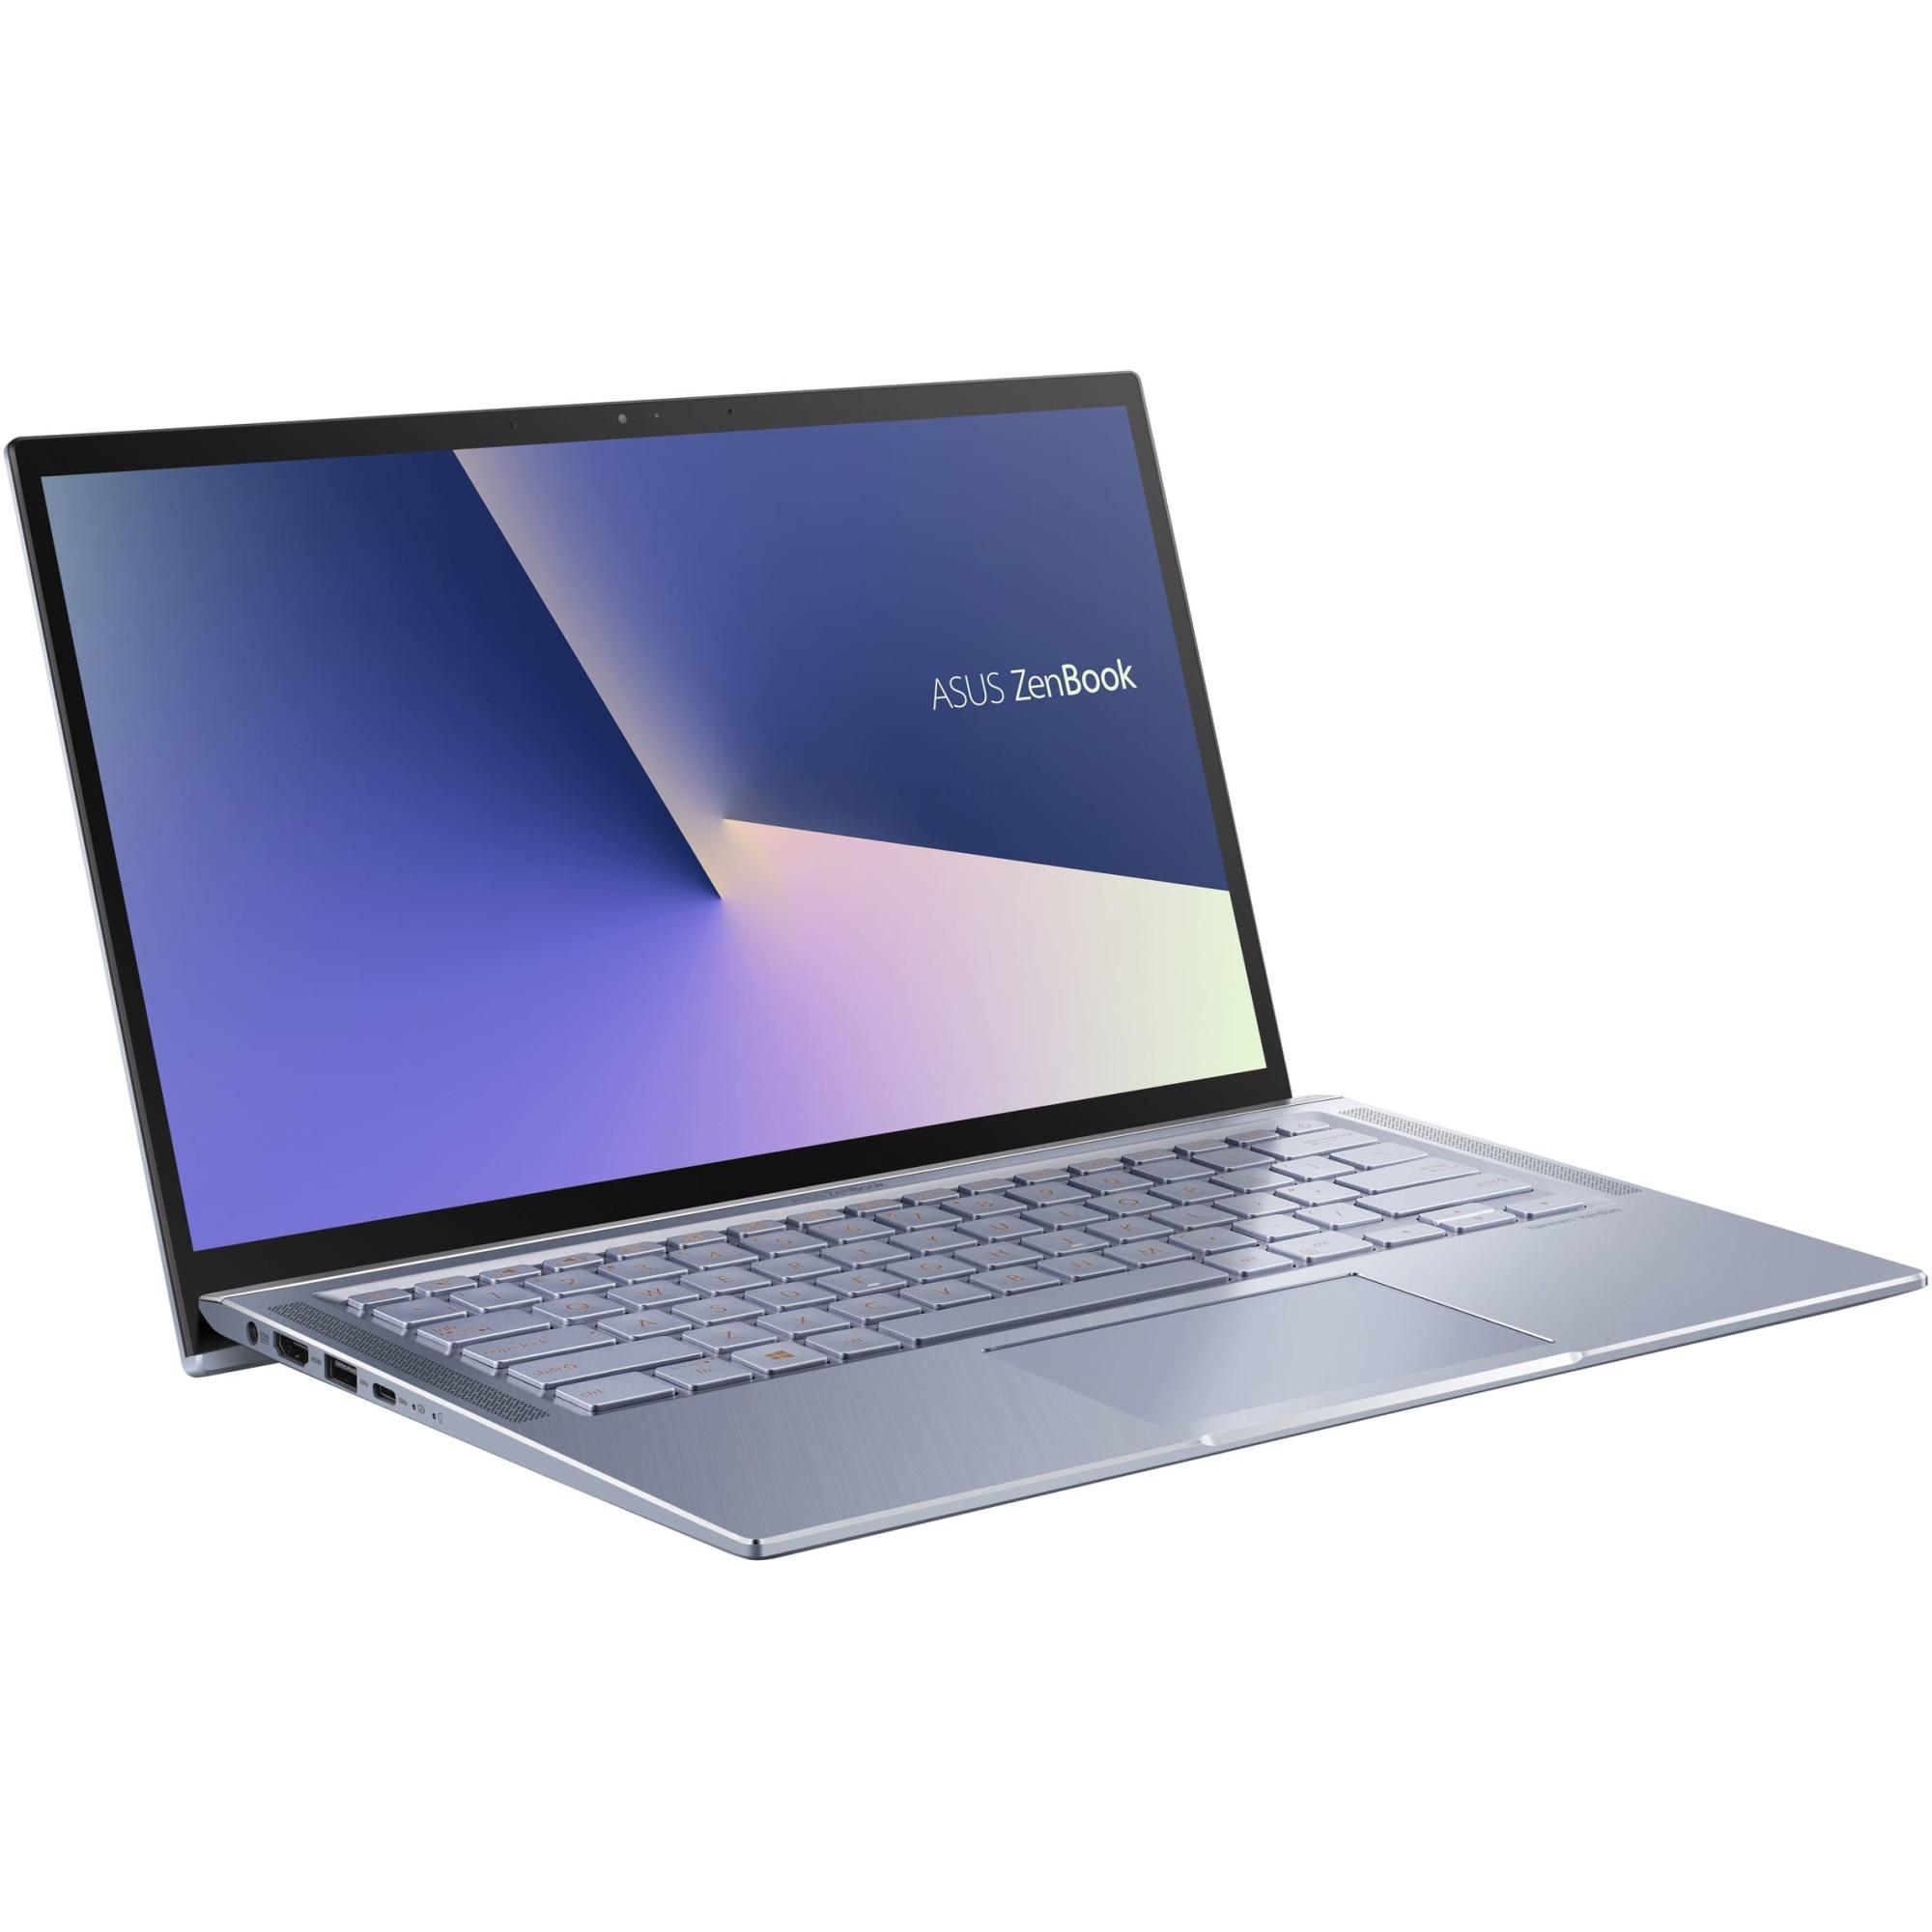 "Fotografie Laptop ultraportabil ASUS ZenBook 14 UM431DA cu procesor AMD Ryzen™ 7 3700U pana la 4.00 GHz, 14"", Full HD, 16GB, 1TB SSD, Radeon™ RX Vega 10, Endless OS, Utopia Blue Metal"